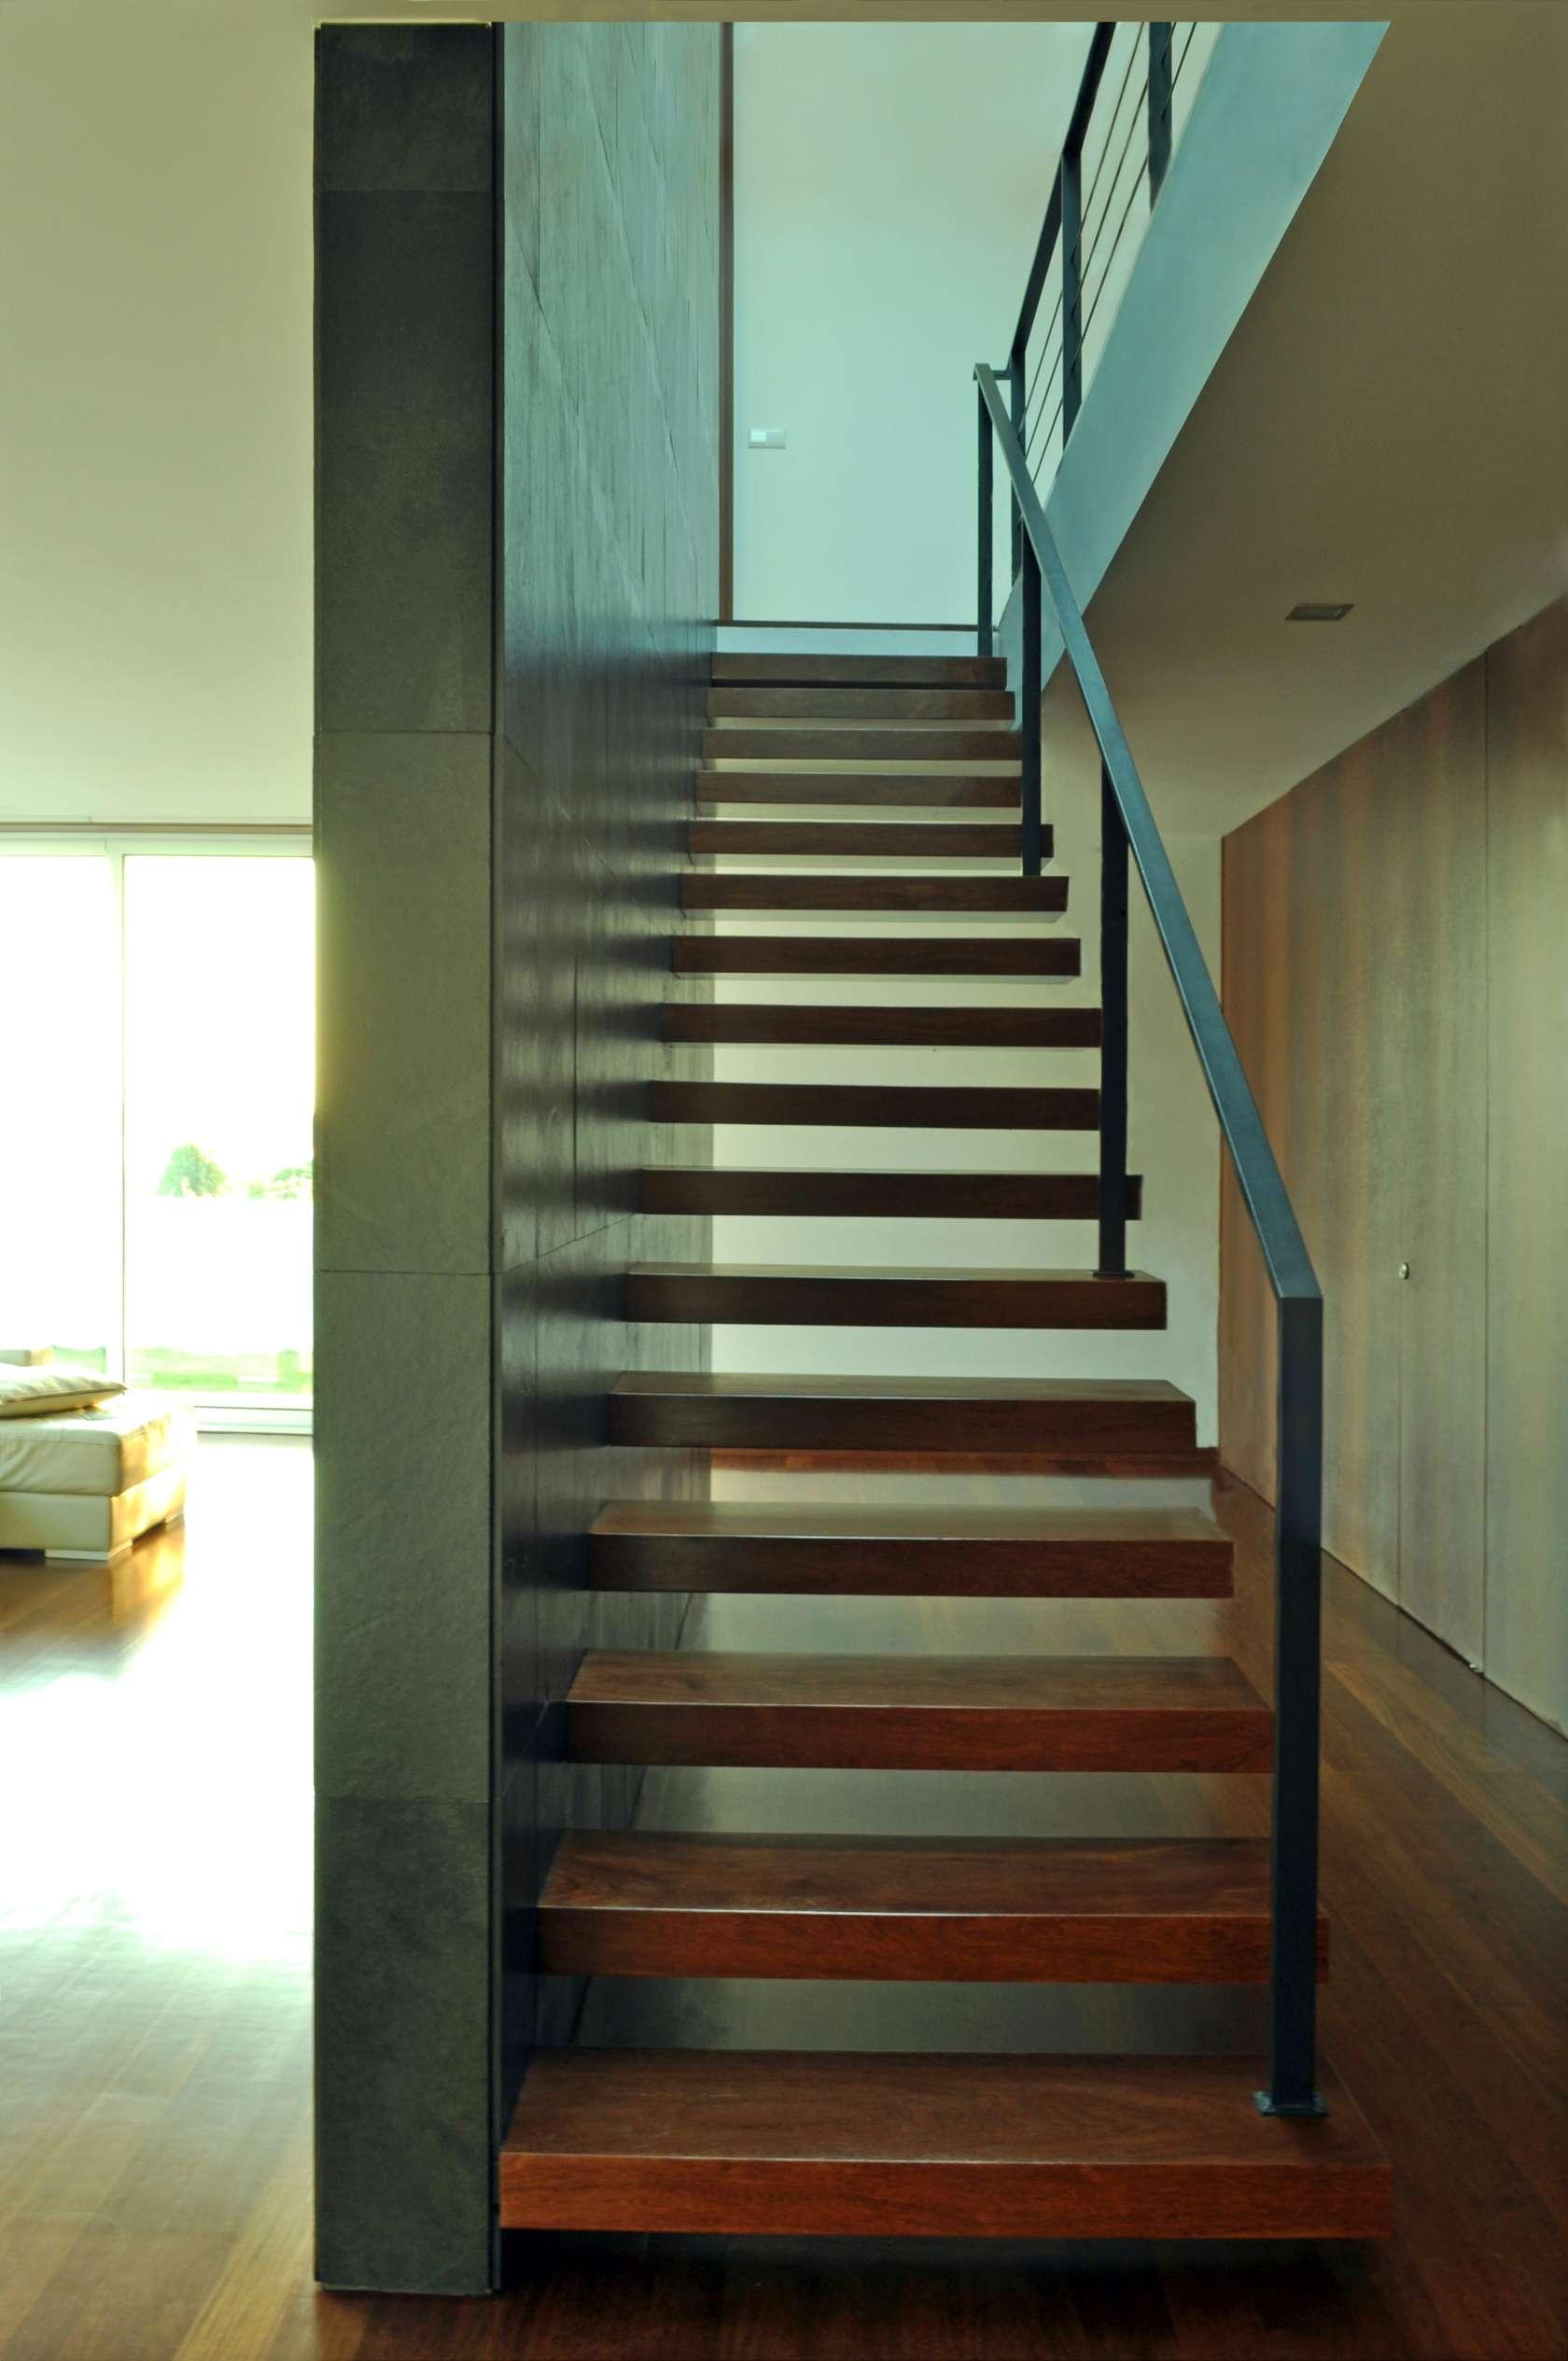 Dise o de casa cuadrada de dos pisos con planos y fachadas for Escaleras interiores de casas pequenas